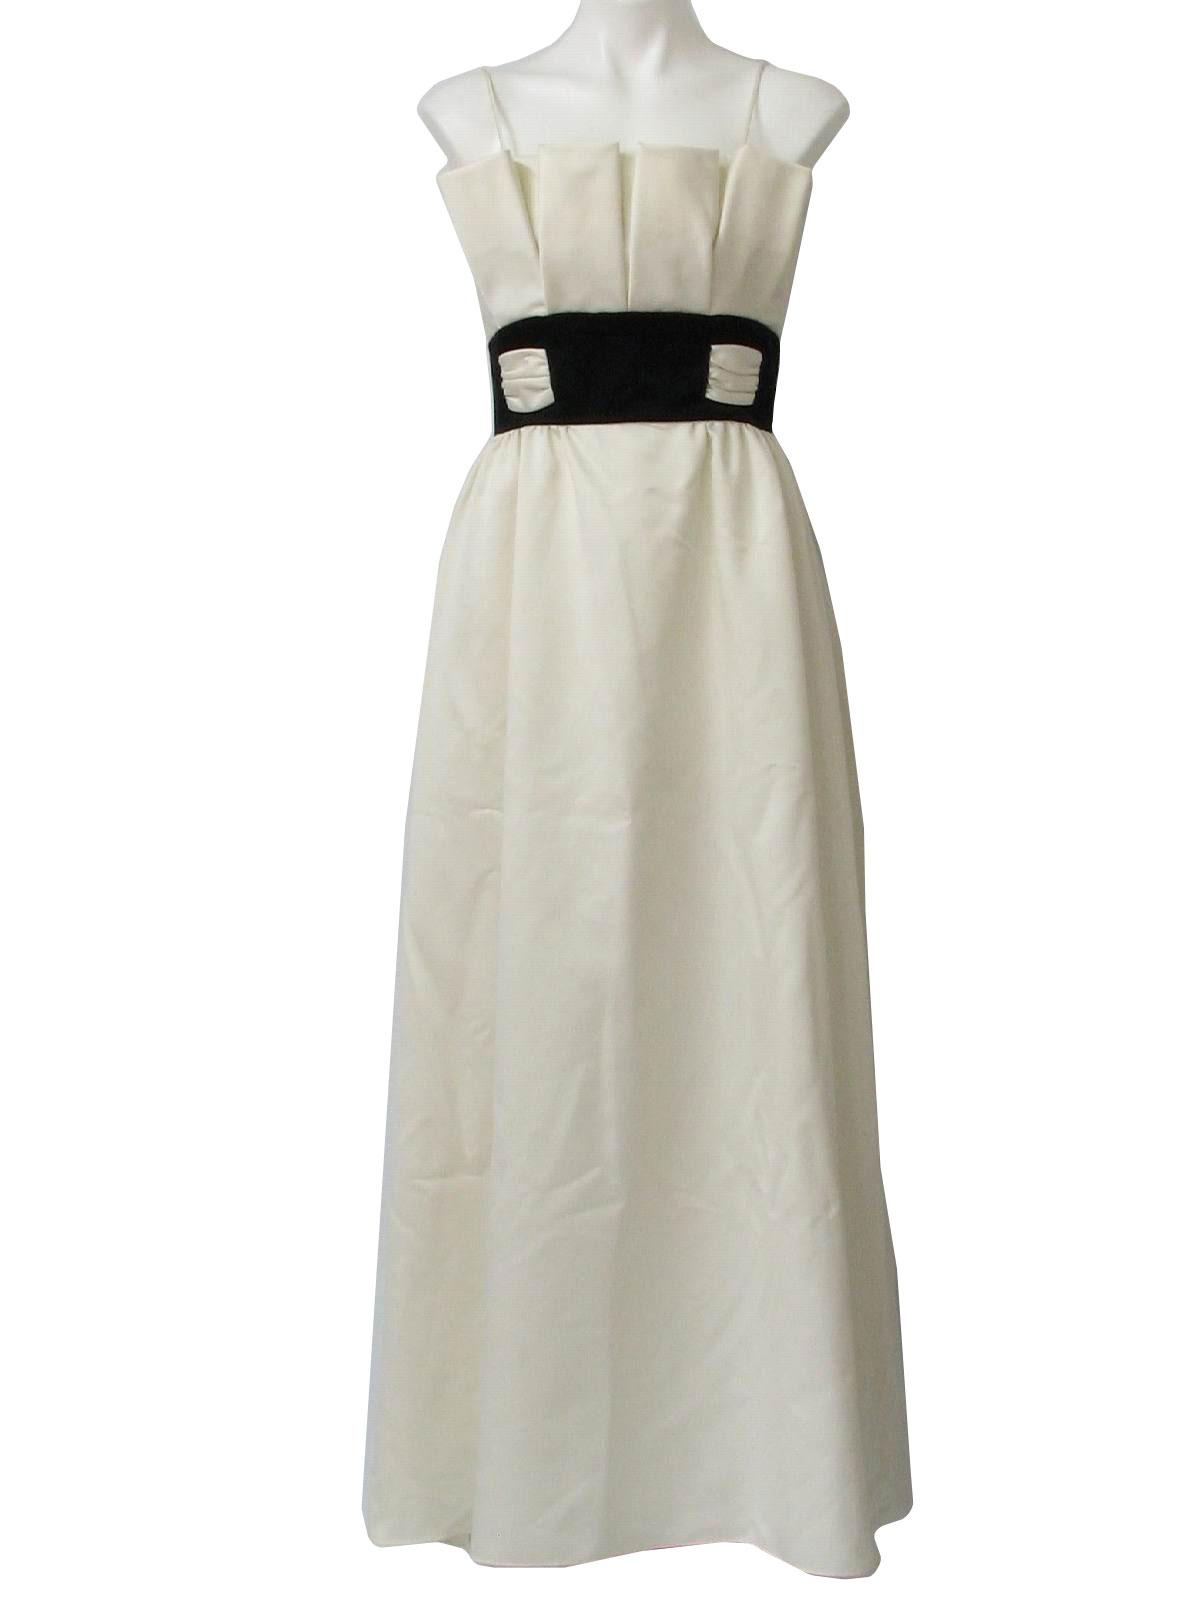 Womens Designer Dresses - Cocktail Dresses 2016